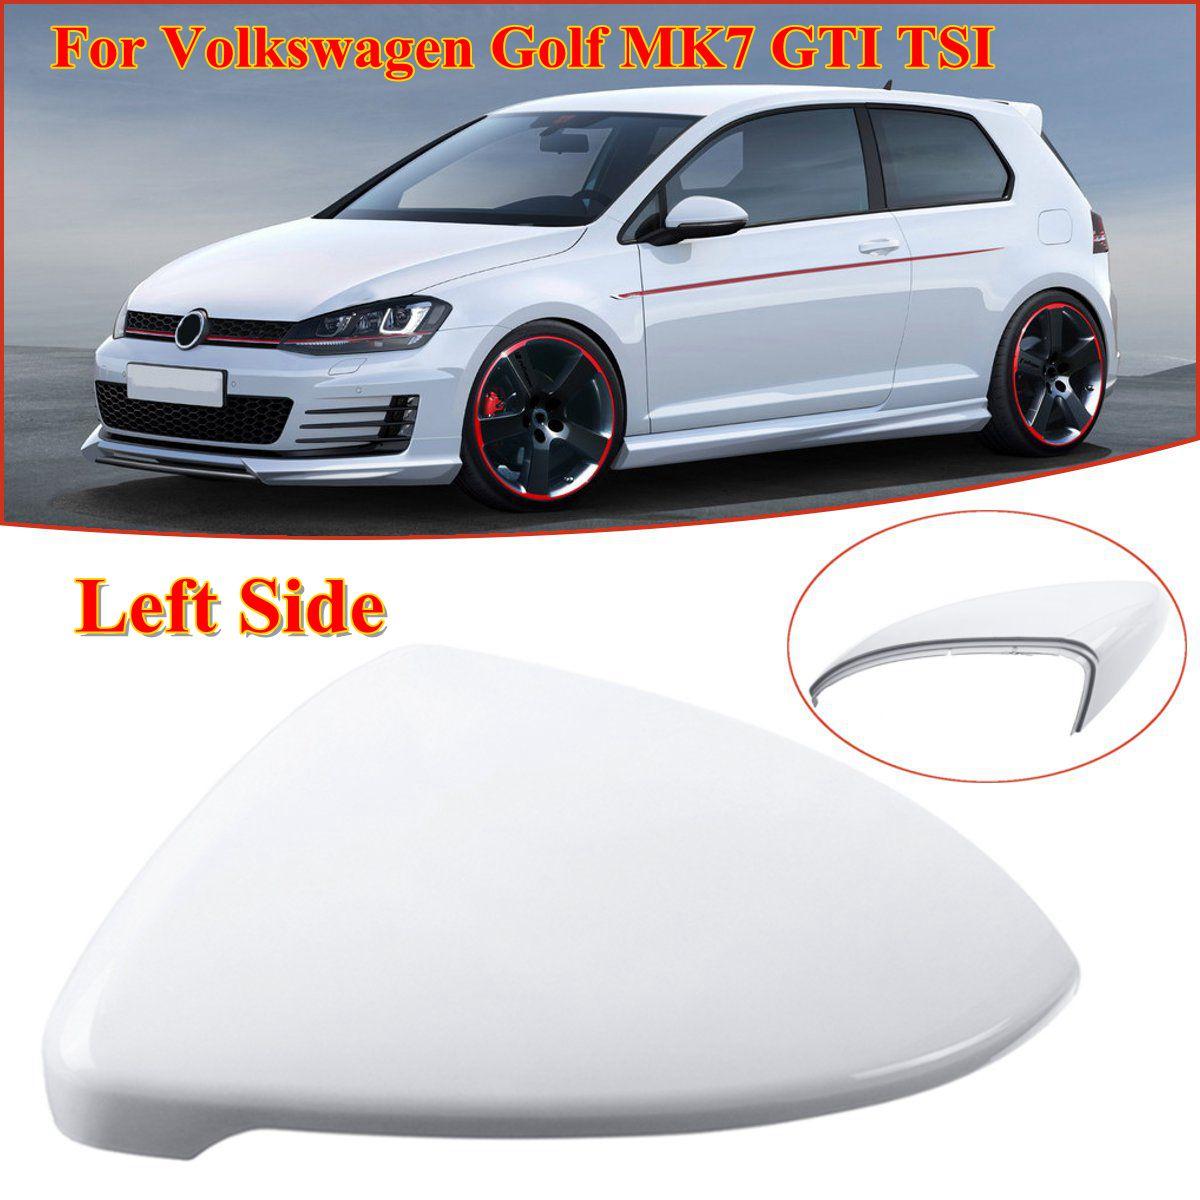 Pure White Left or Right Side Car Mirror Cover Caps For Volkswagen Golf MK7 GTI TSI 14-17